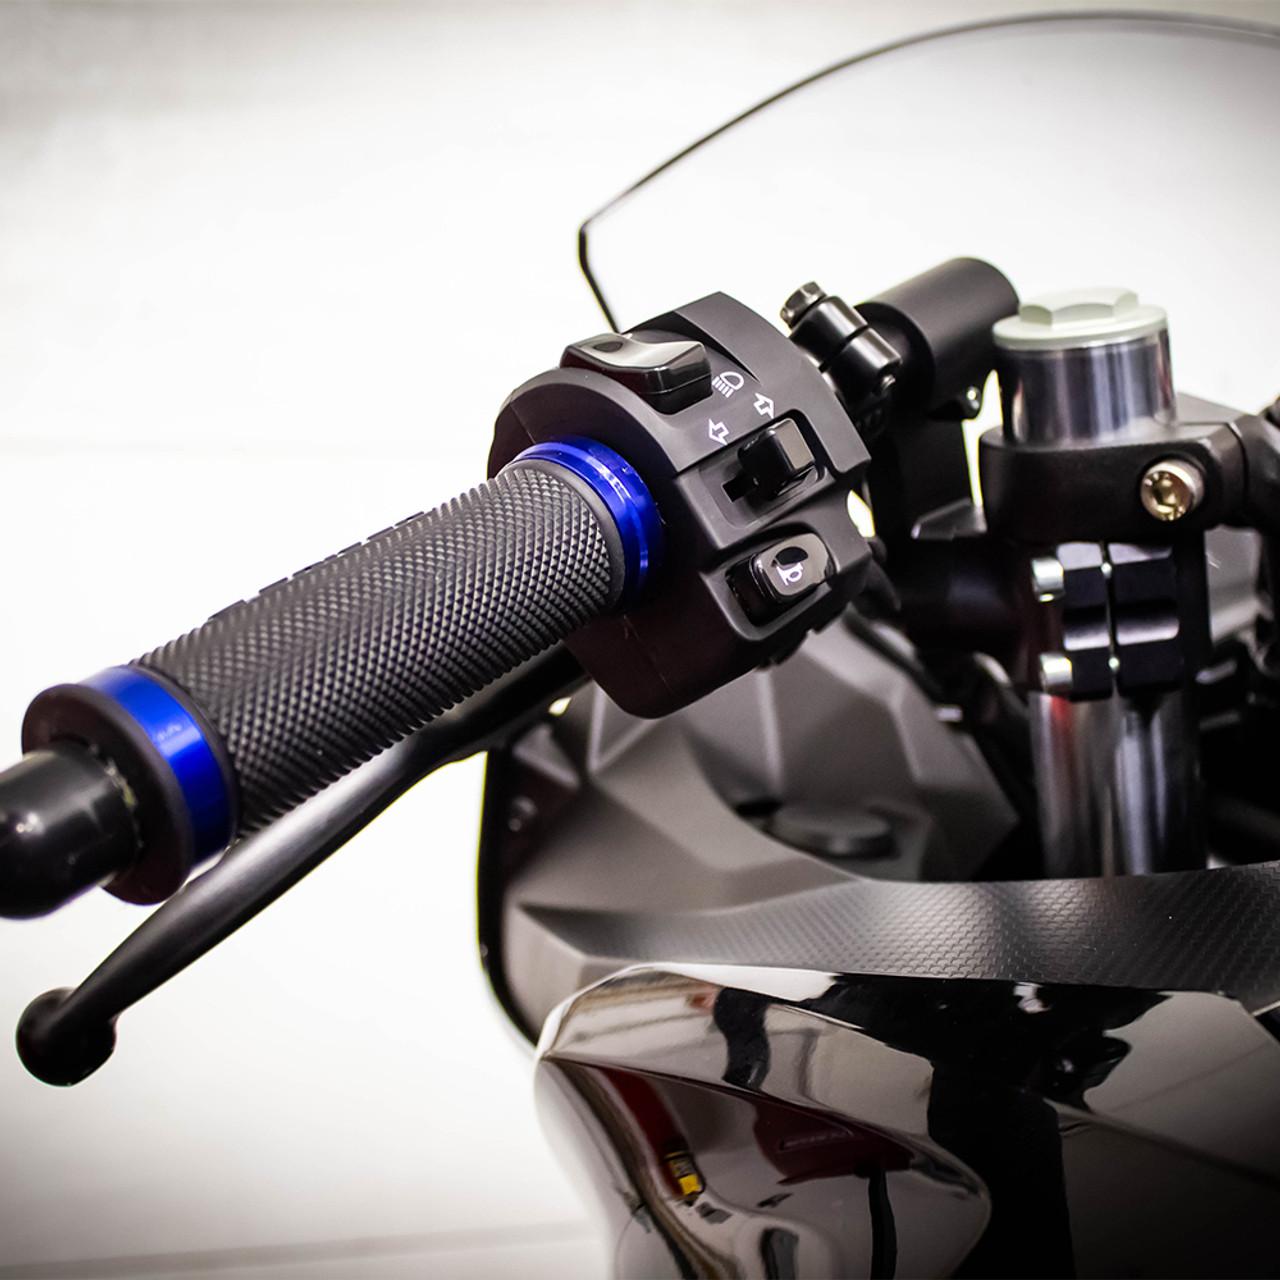 Woodcraft Kawasaki Ninja 400 18-19 Clip-on Riser Assembly w/ Bars